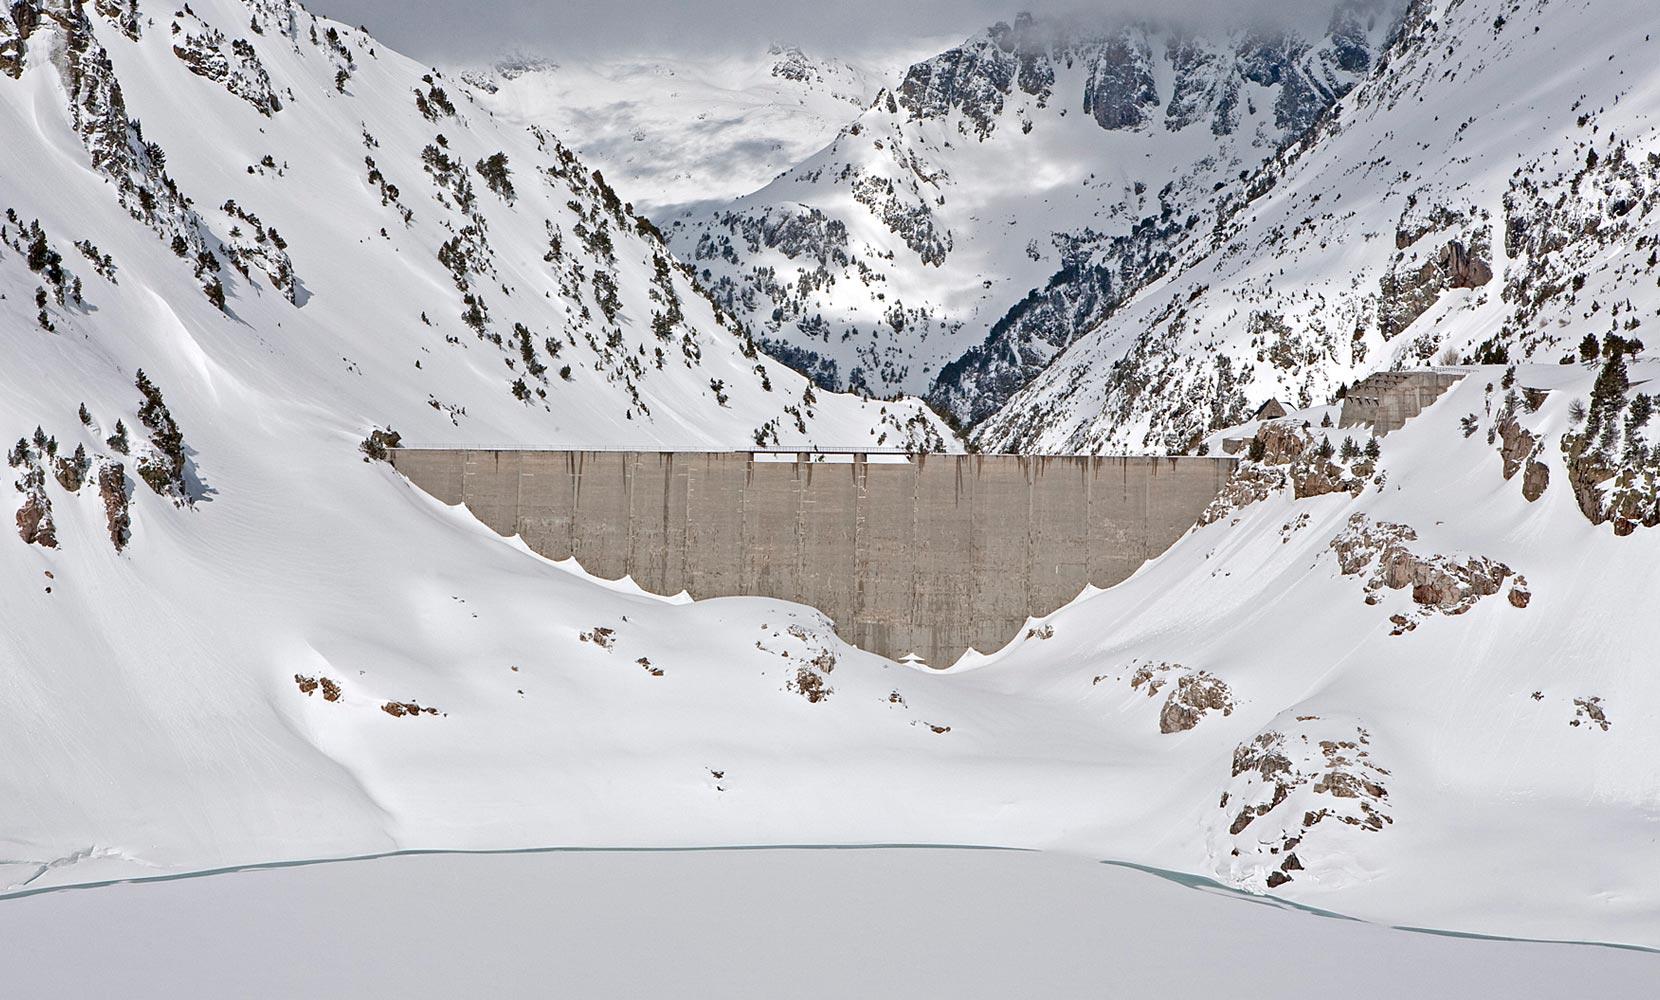 Reservoir of Respomuso | ACCIONA Energía